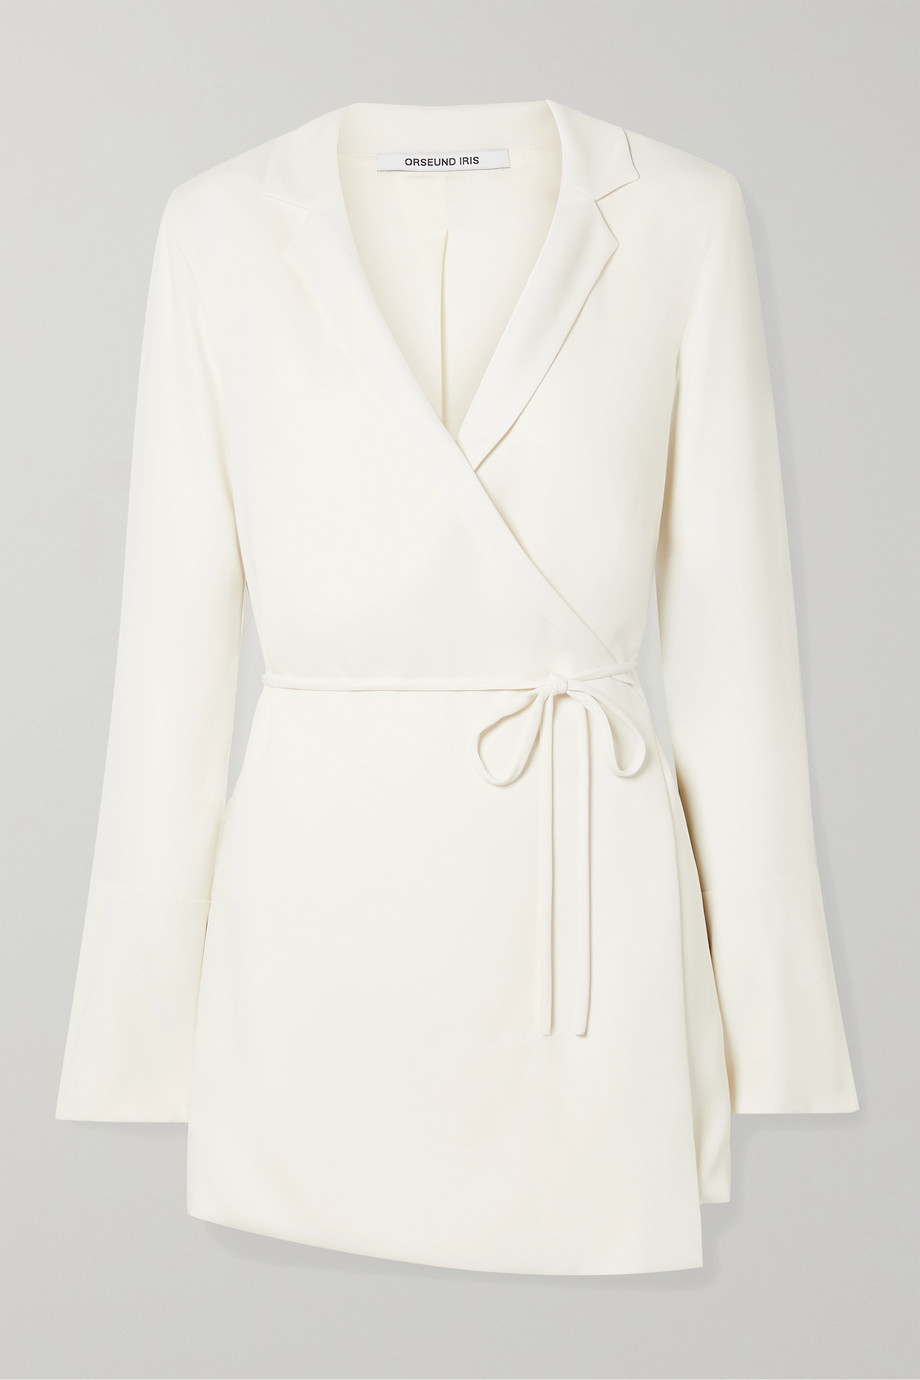 Orseund Iris Mini-robe portefeuille en crêpe Boxy